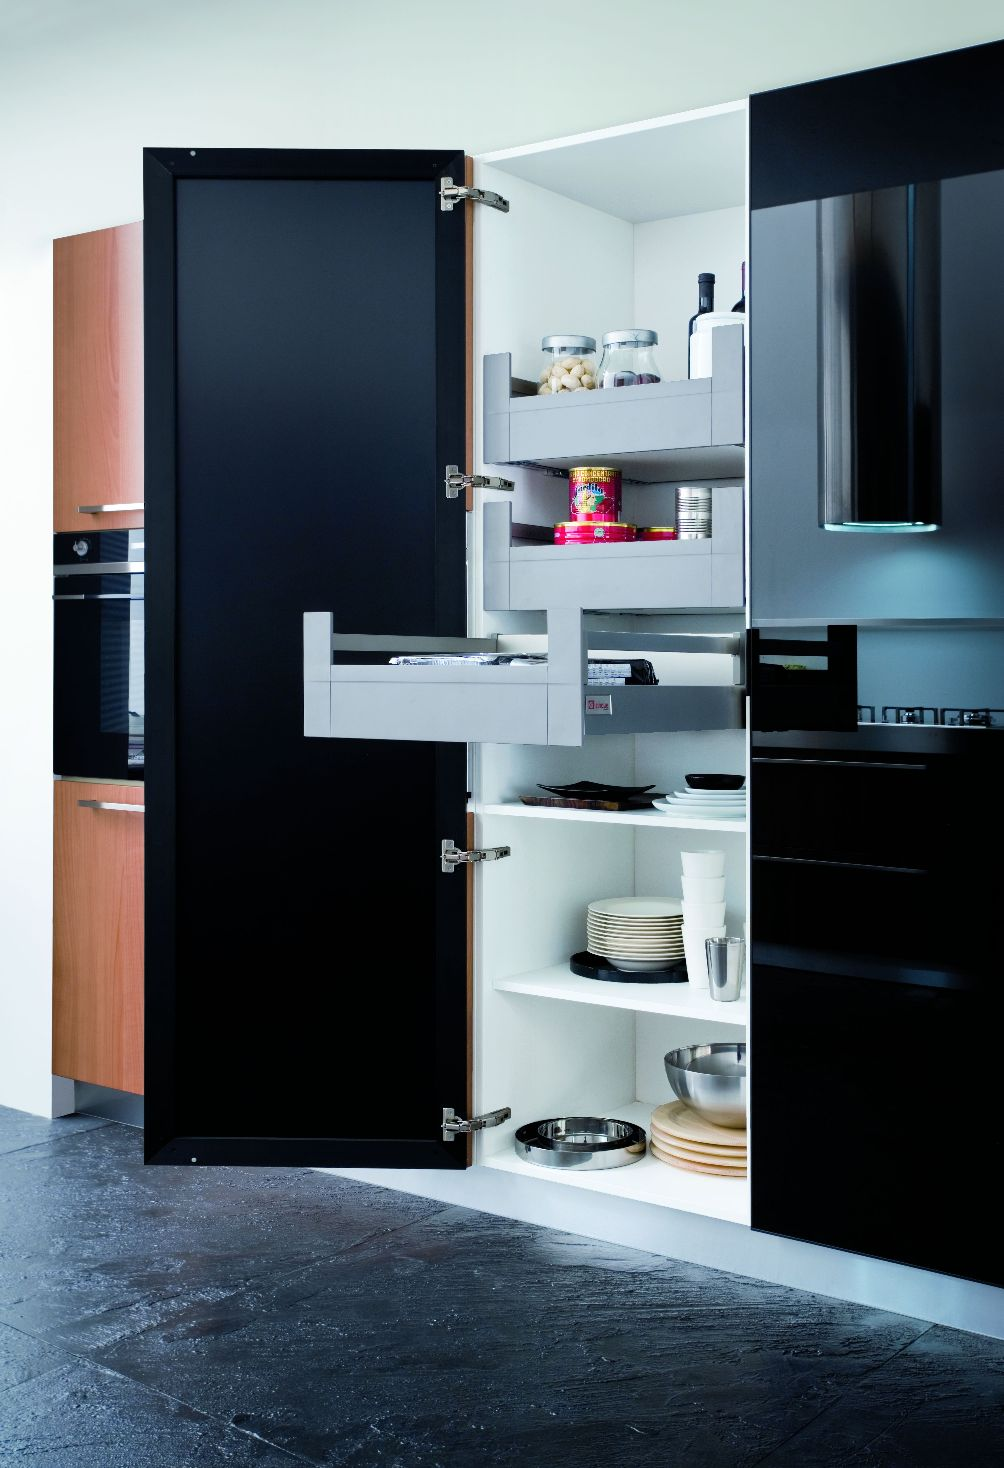 cuisine parall le. Black Bedroom Furniture Sets. Home Design Ideas